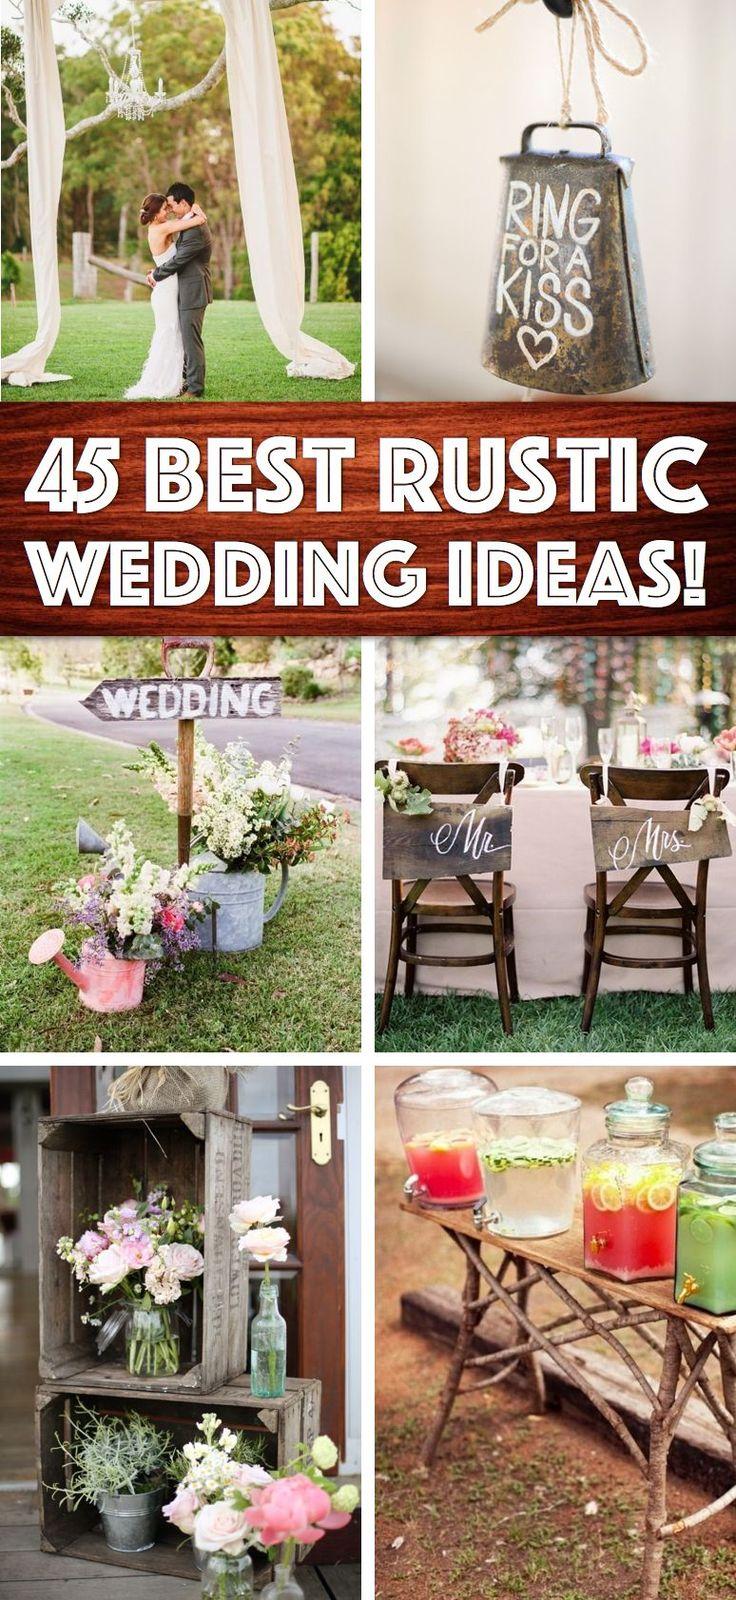 ideas for rustic wedding reception%0A nurse objective resume